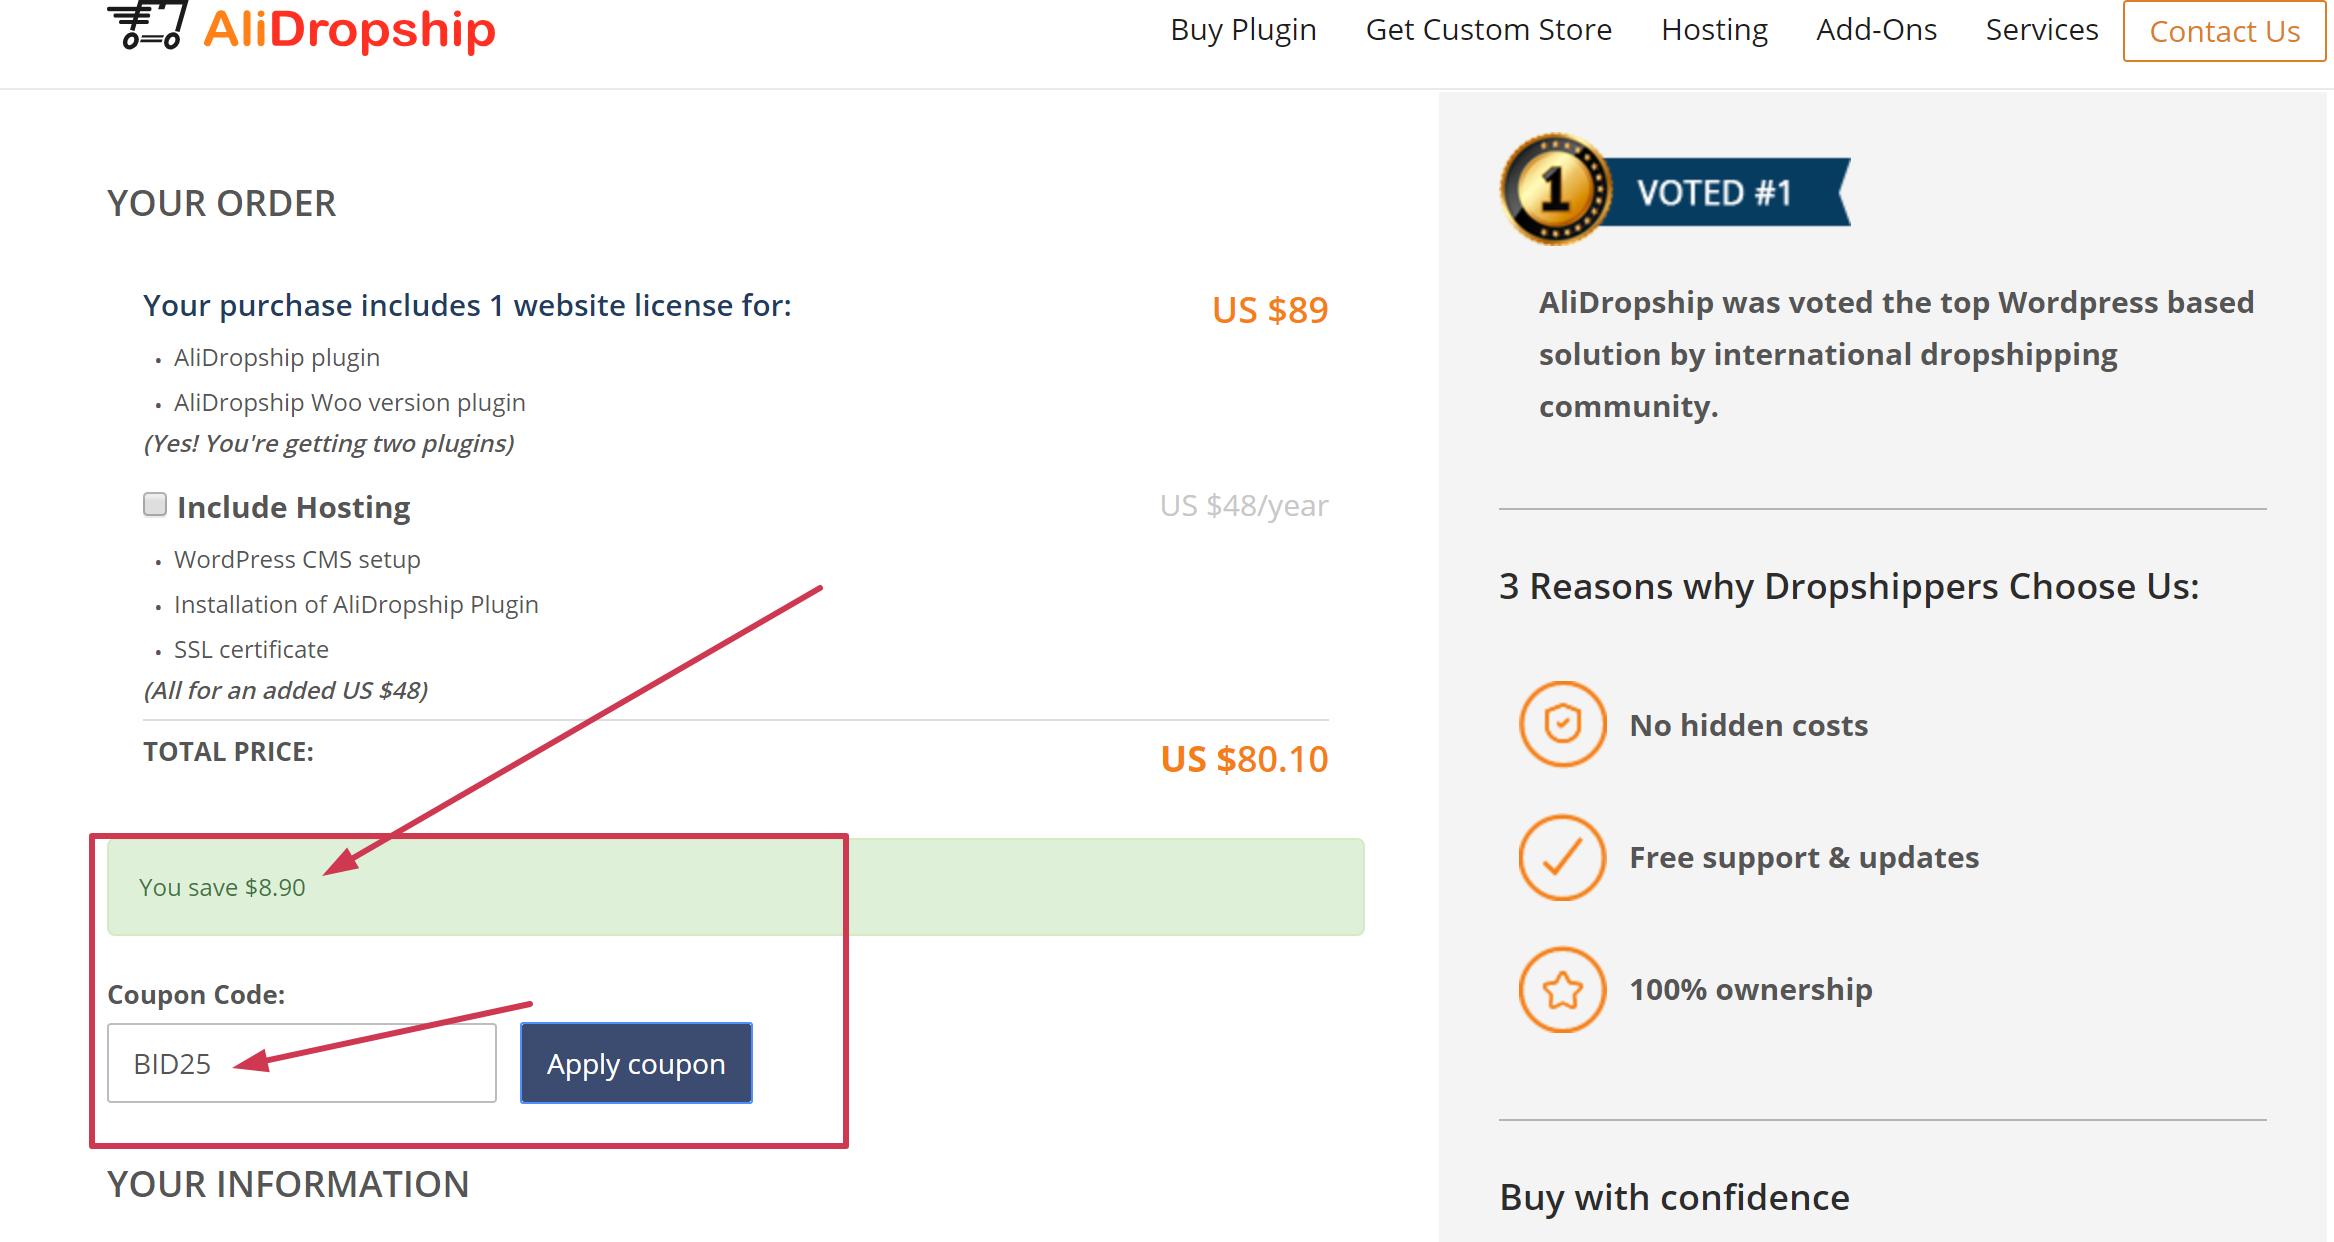 Alidropship coupon code promo discount coupon